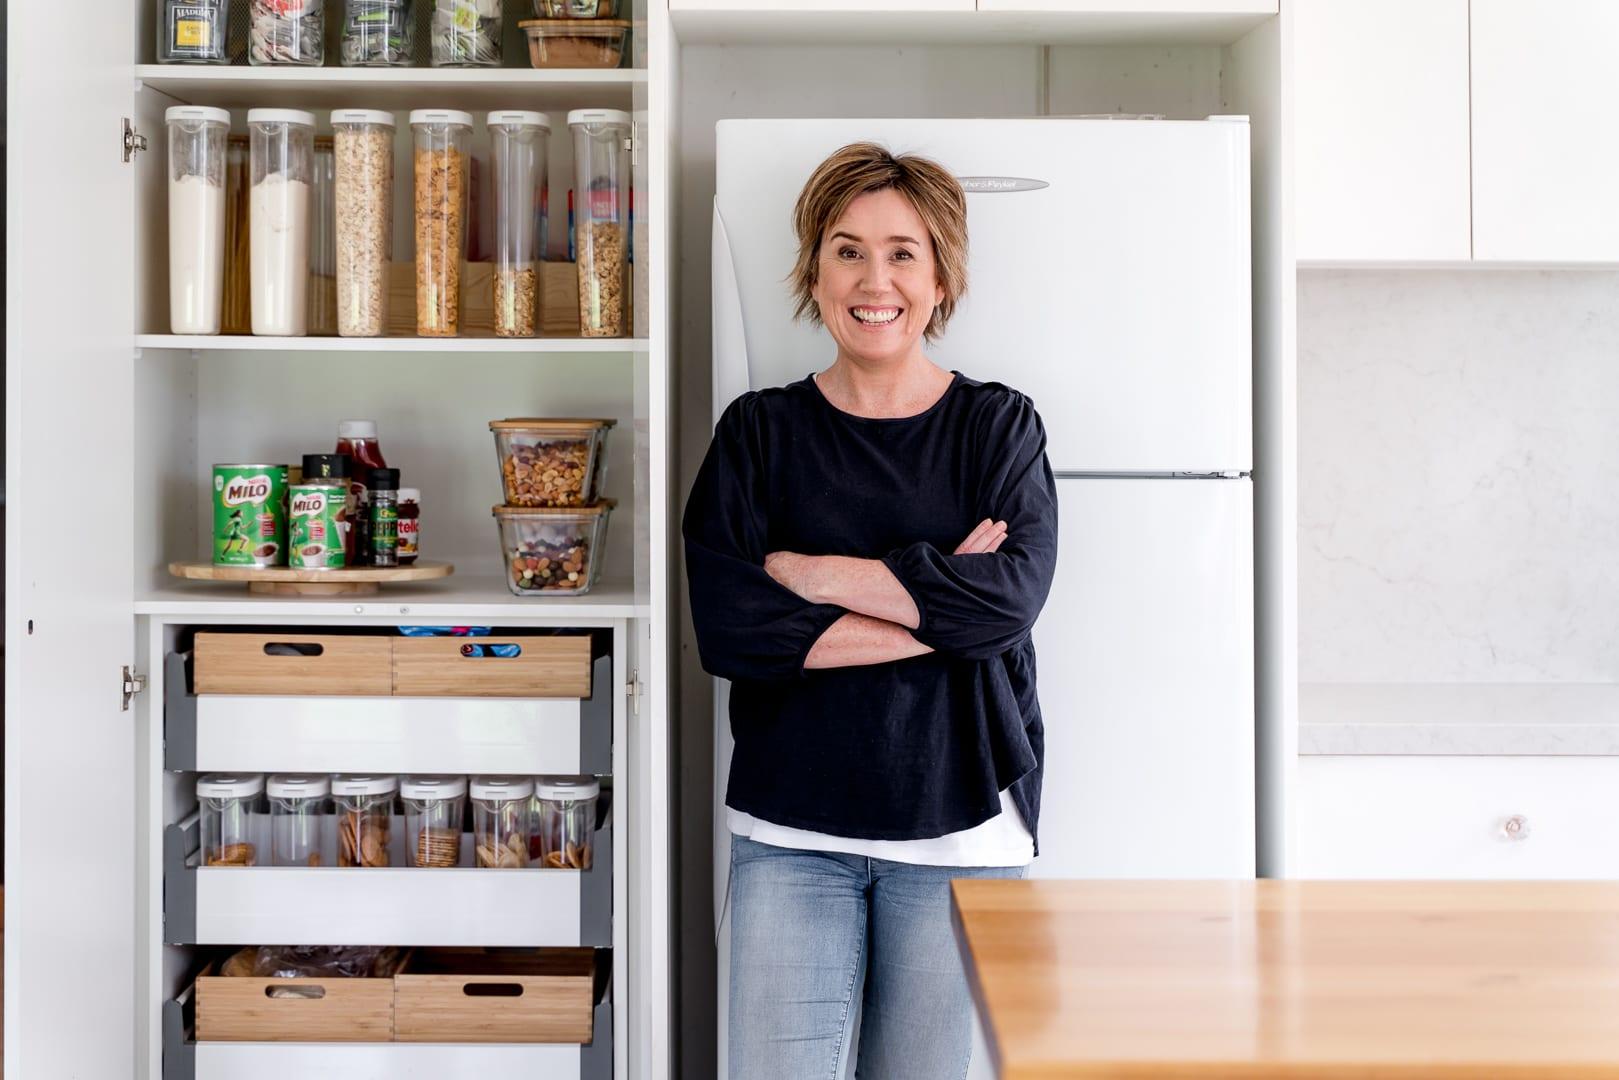 Ikea Adelaide Pantry Makeover With Sarah Shanahan She Shopped